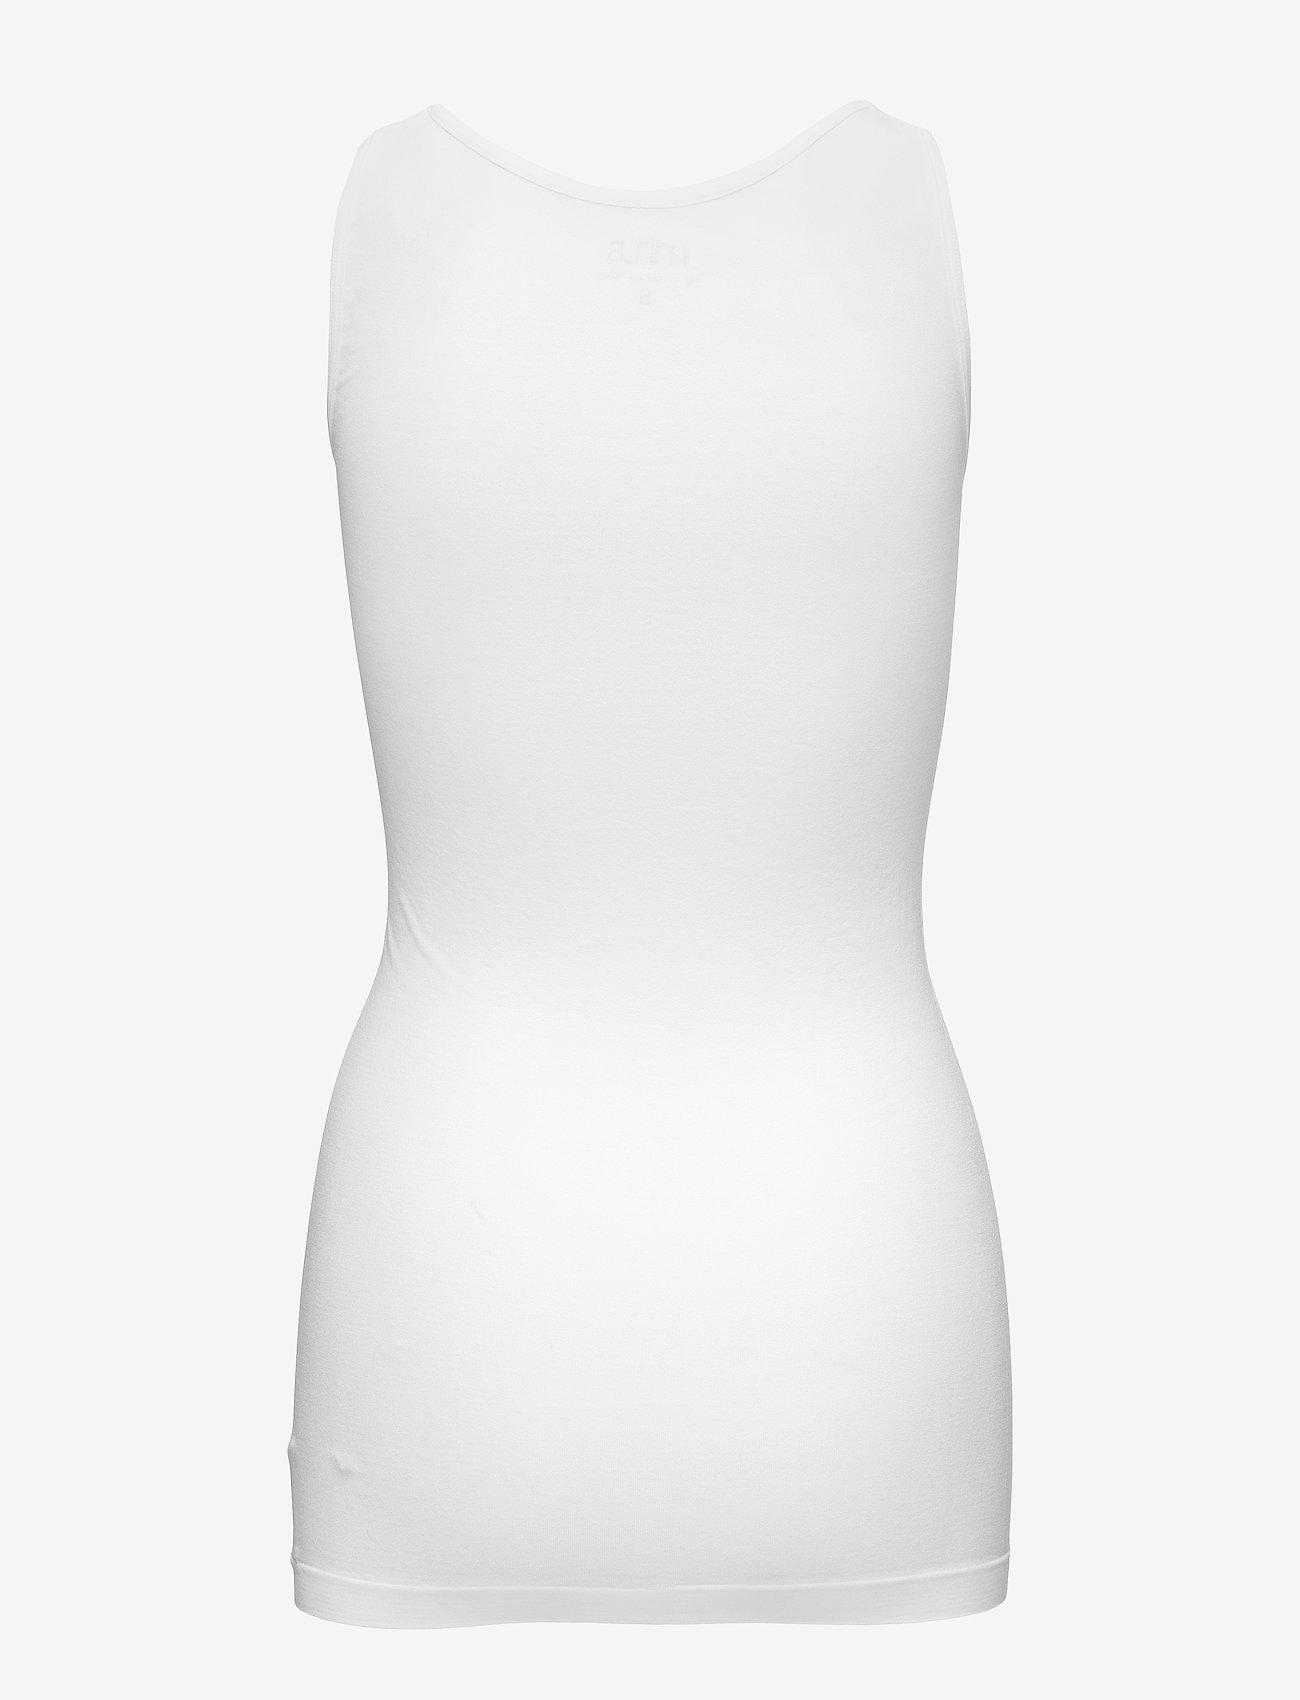 Minus - CLARICE top - sleeveless tops - white